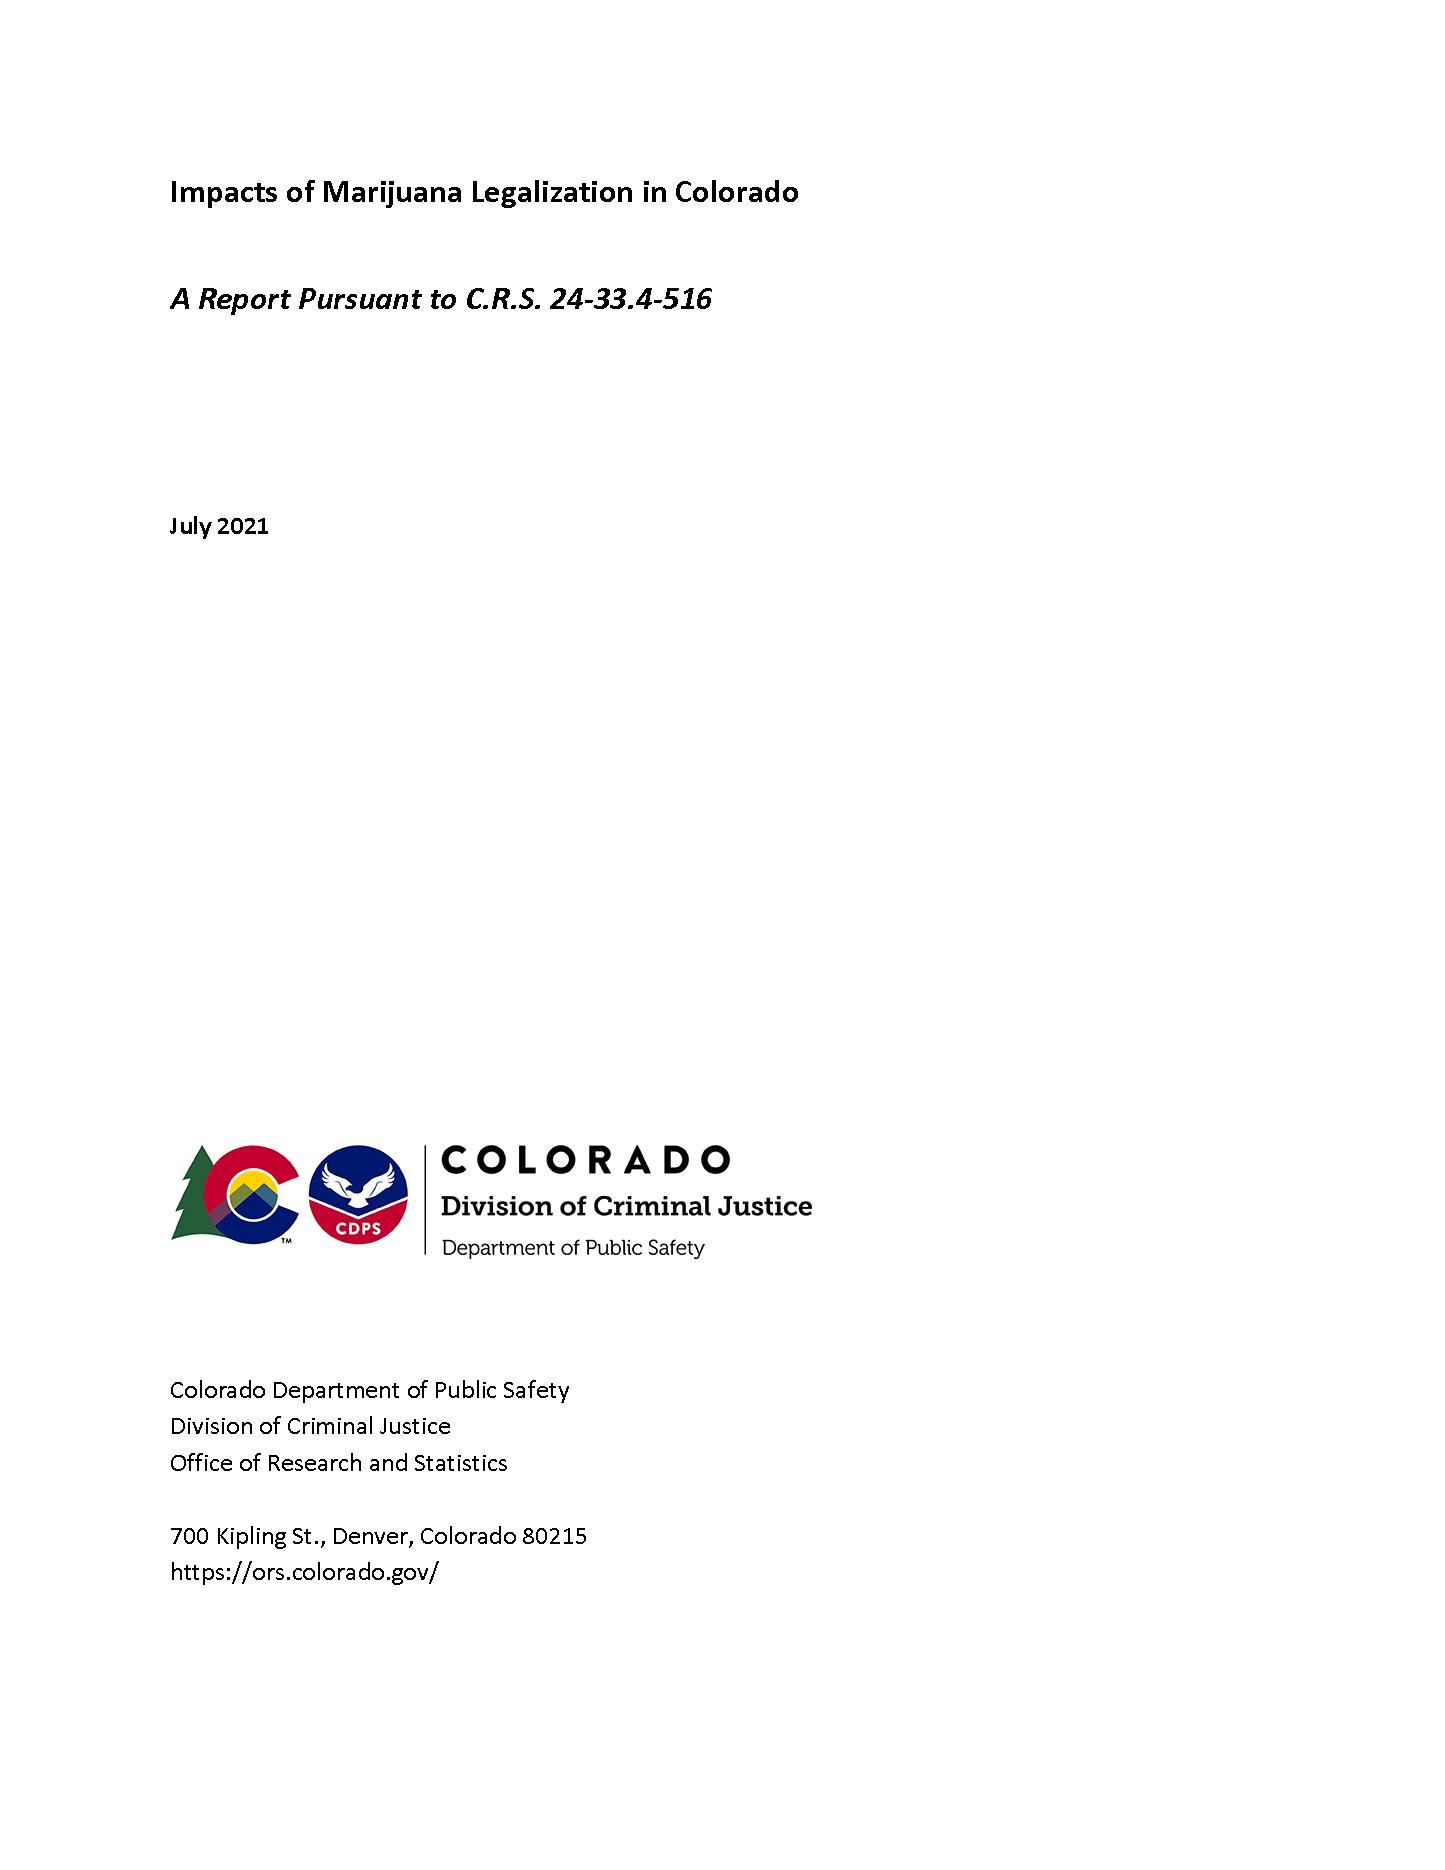 Impacts of Marijuana Legalization in Colorado (July 2021)